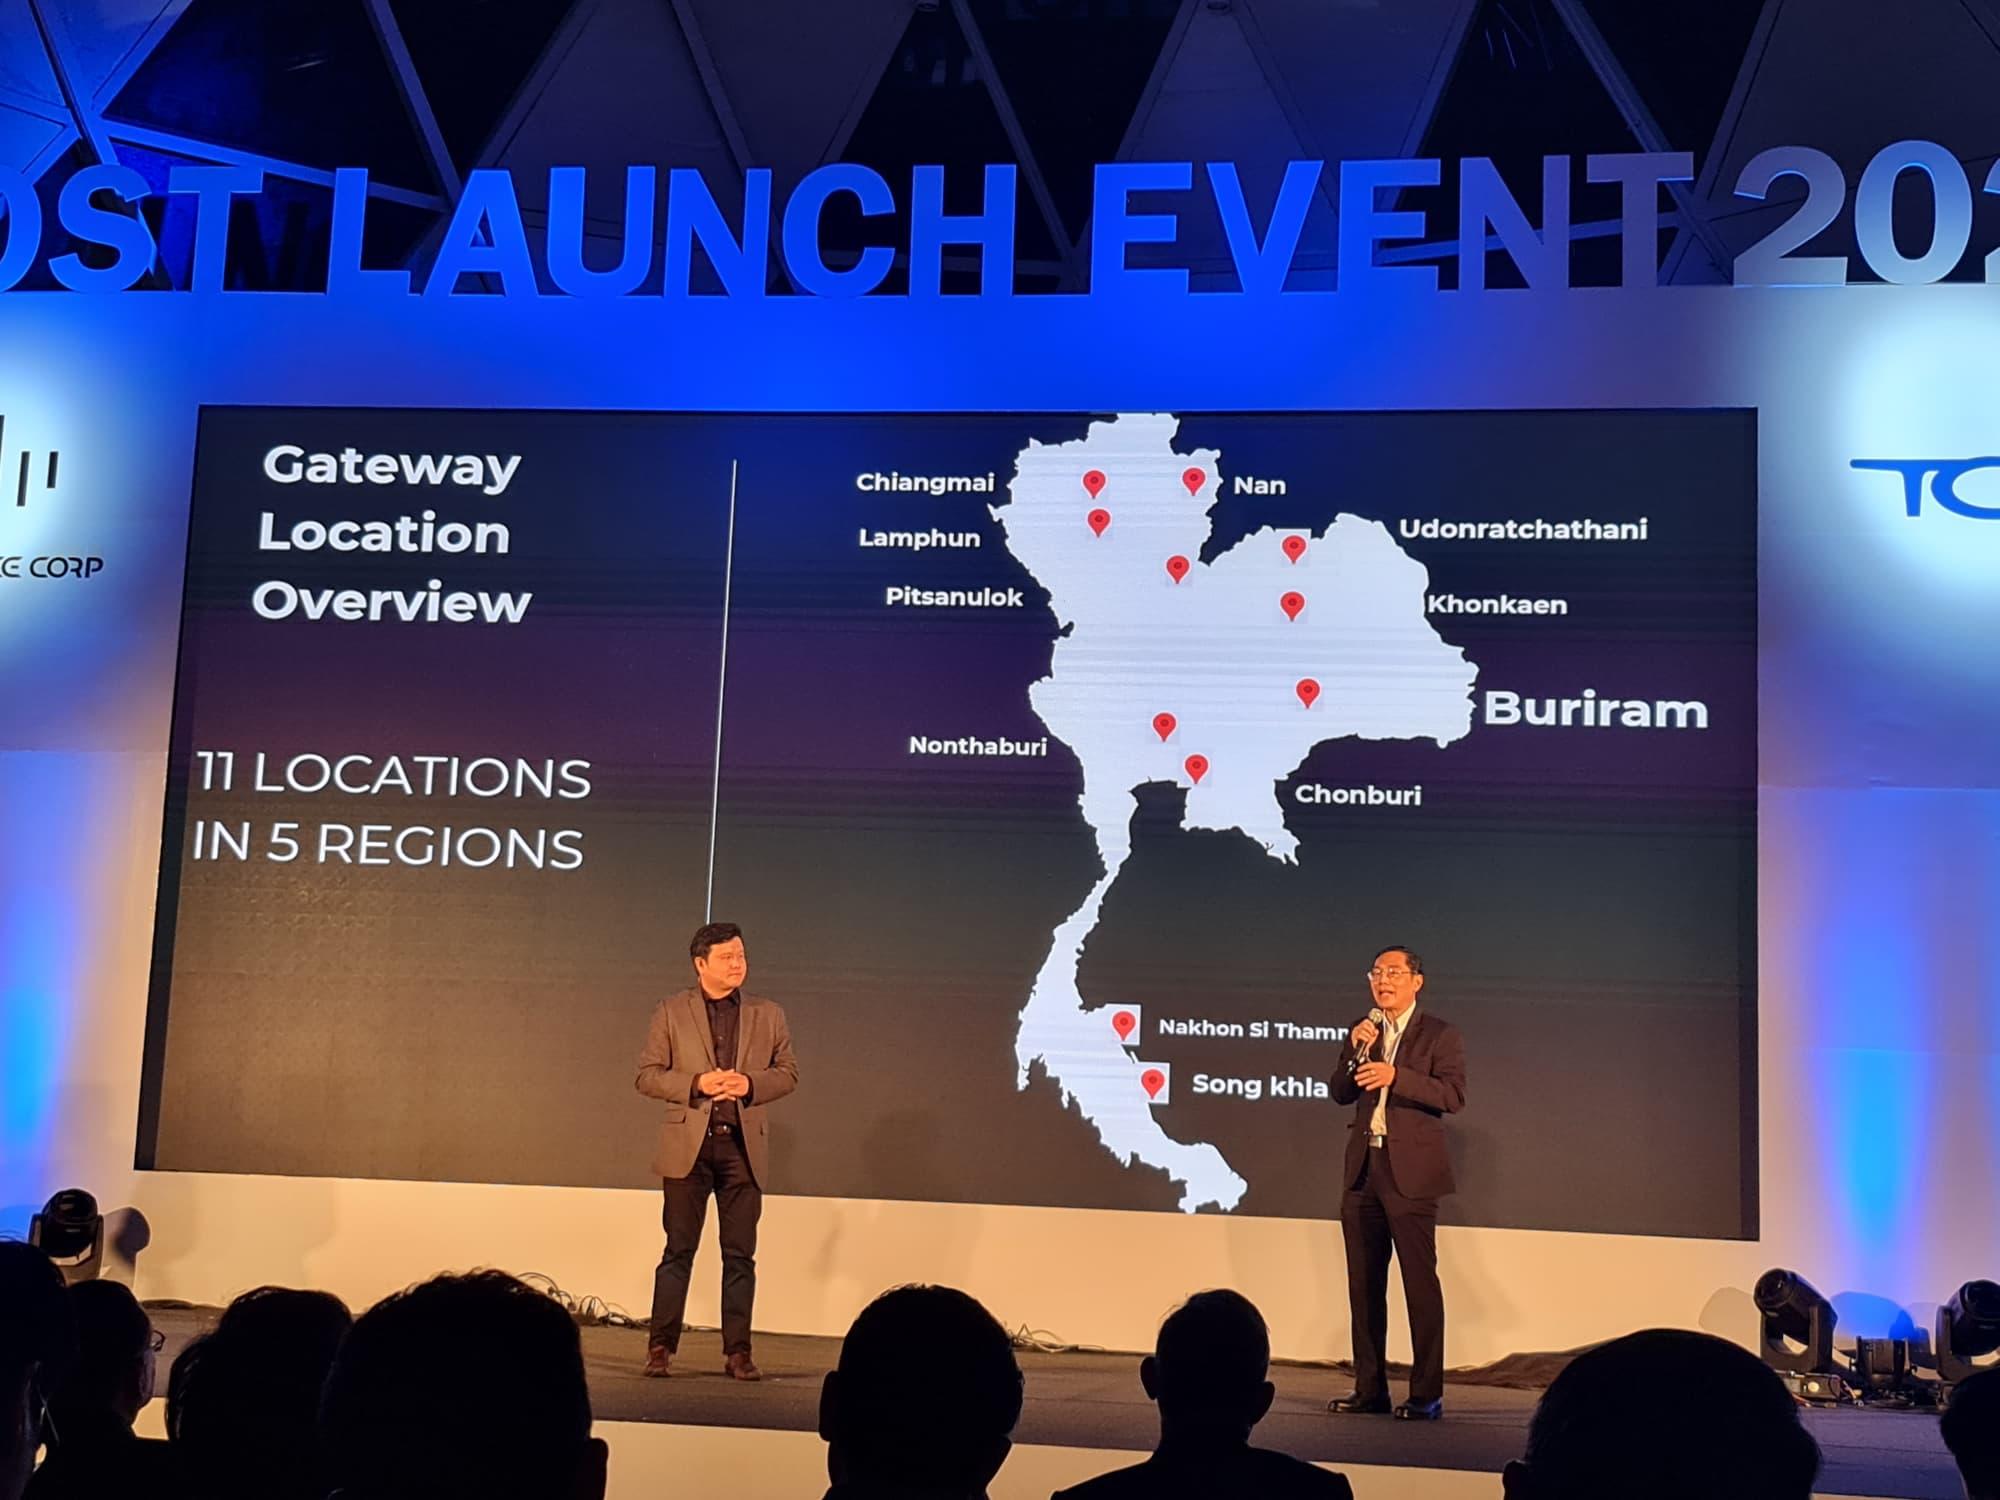 TOT รุกเน็ตดาวเทียม Starlink ของ SpaceX จับมือ Mu Space ลุยสร้างสถานีเกตเวย์ 14 แห่งทั่วประเทศ เริ่มนนทบุรี เตรียมสร้าง Data Center บนอวกาศชาติแรกของโลก